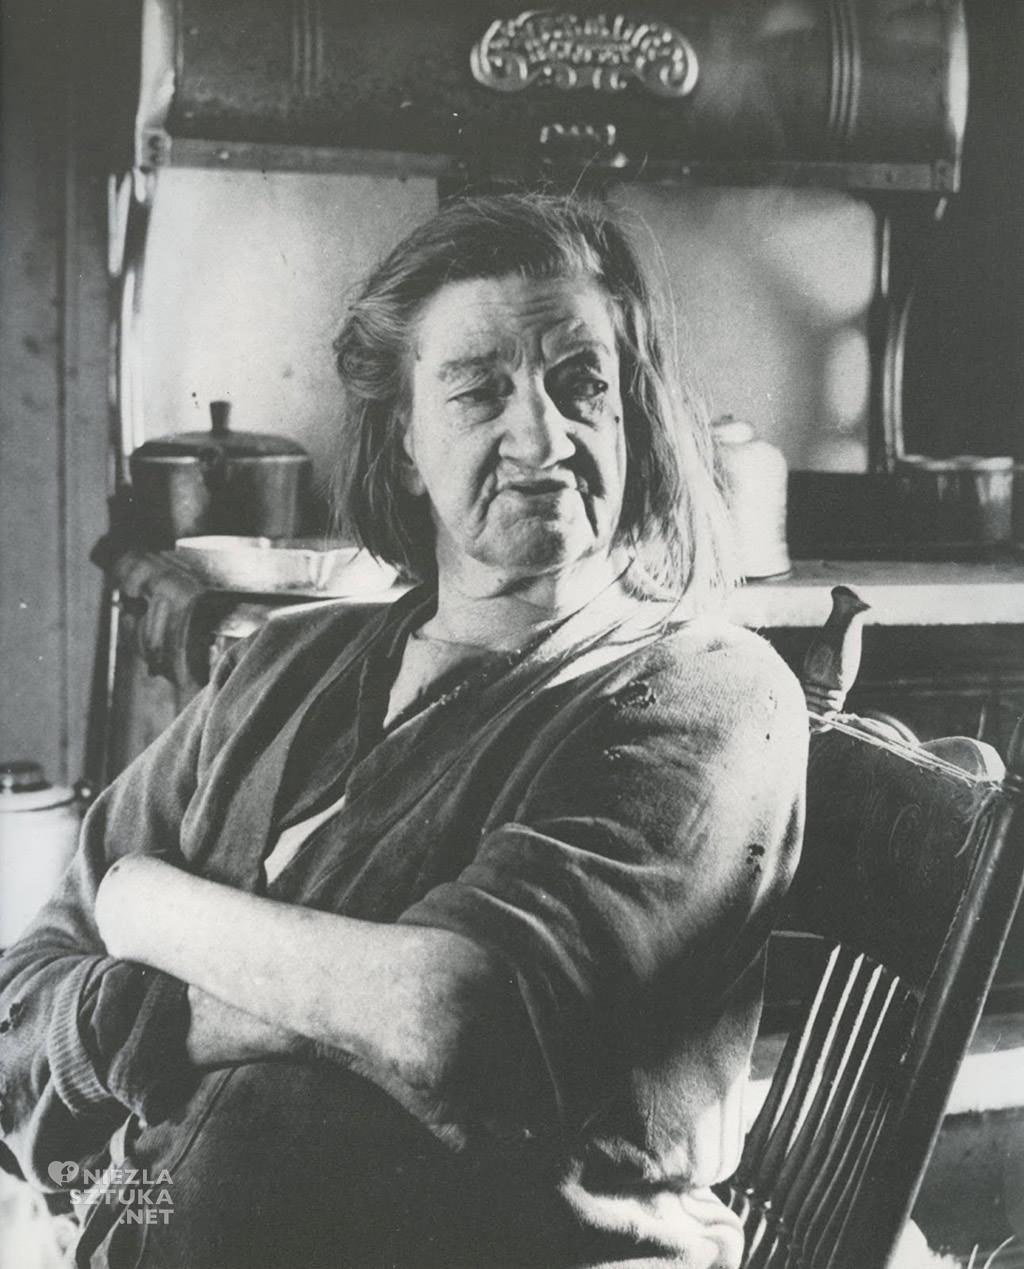 Christina Olson, Andrew Wyeth, Niezła Sztuka